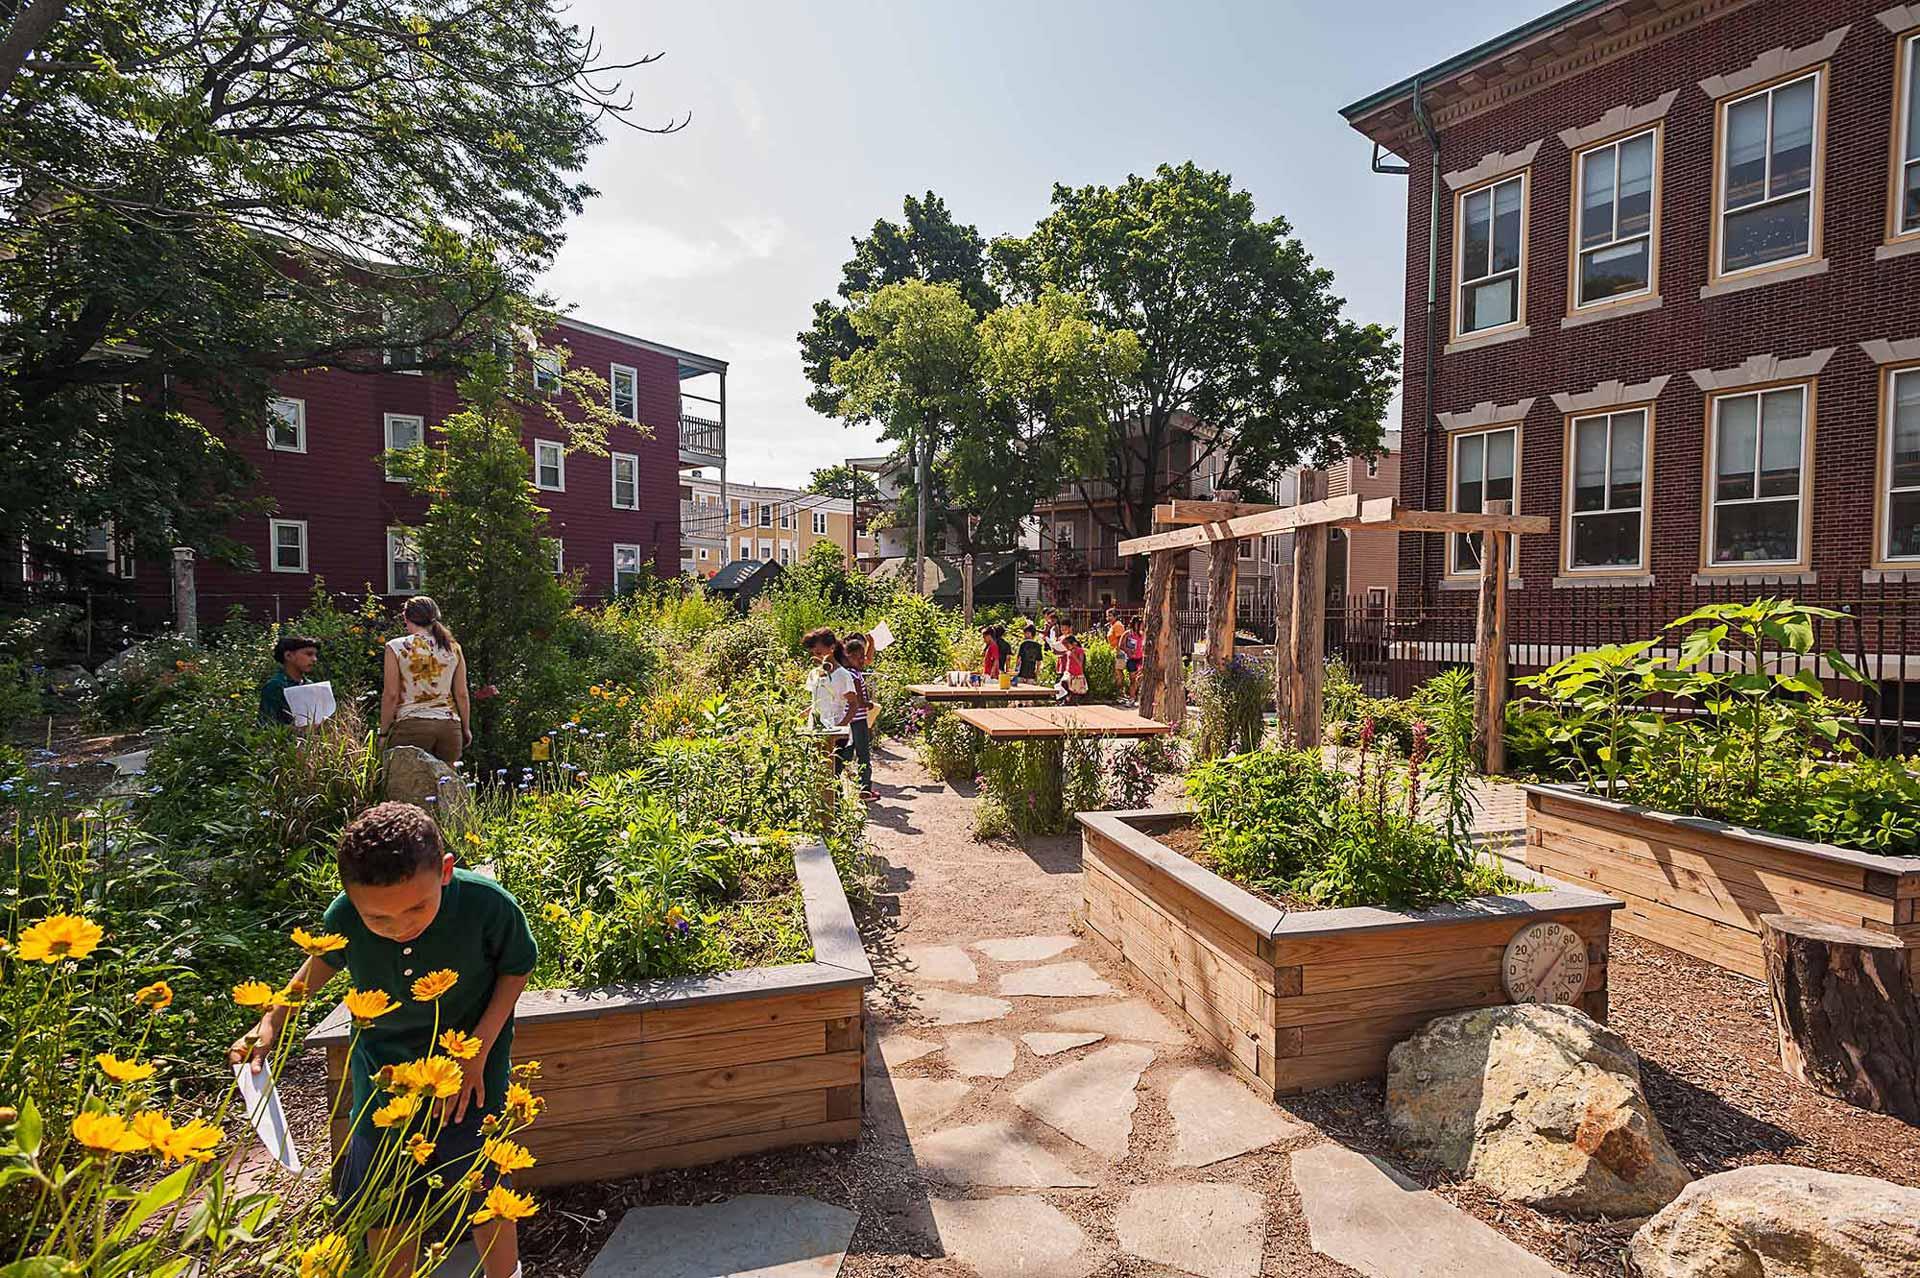 7_Schoolyard-Initiative_Klopfer-Martin-Design-Group_outdoor-classroom_planters.jpg